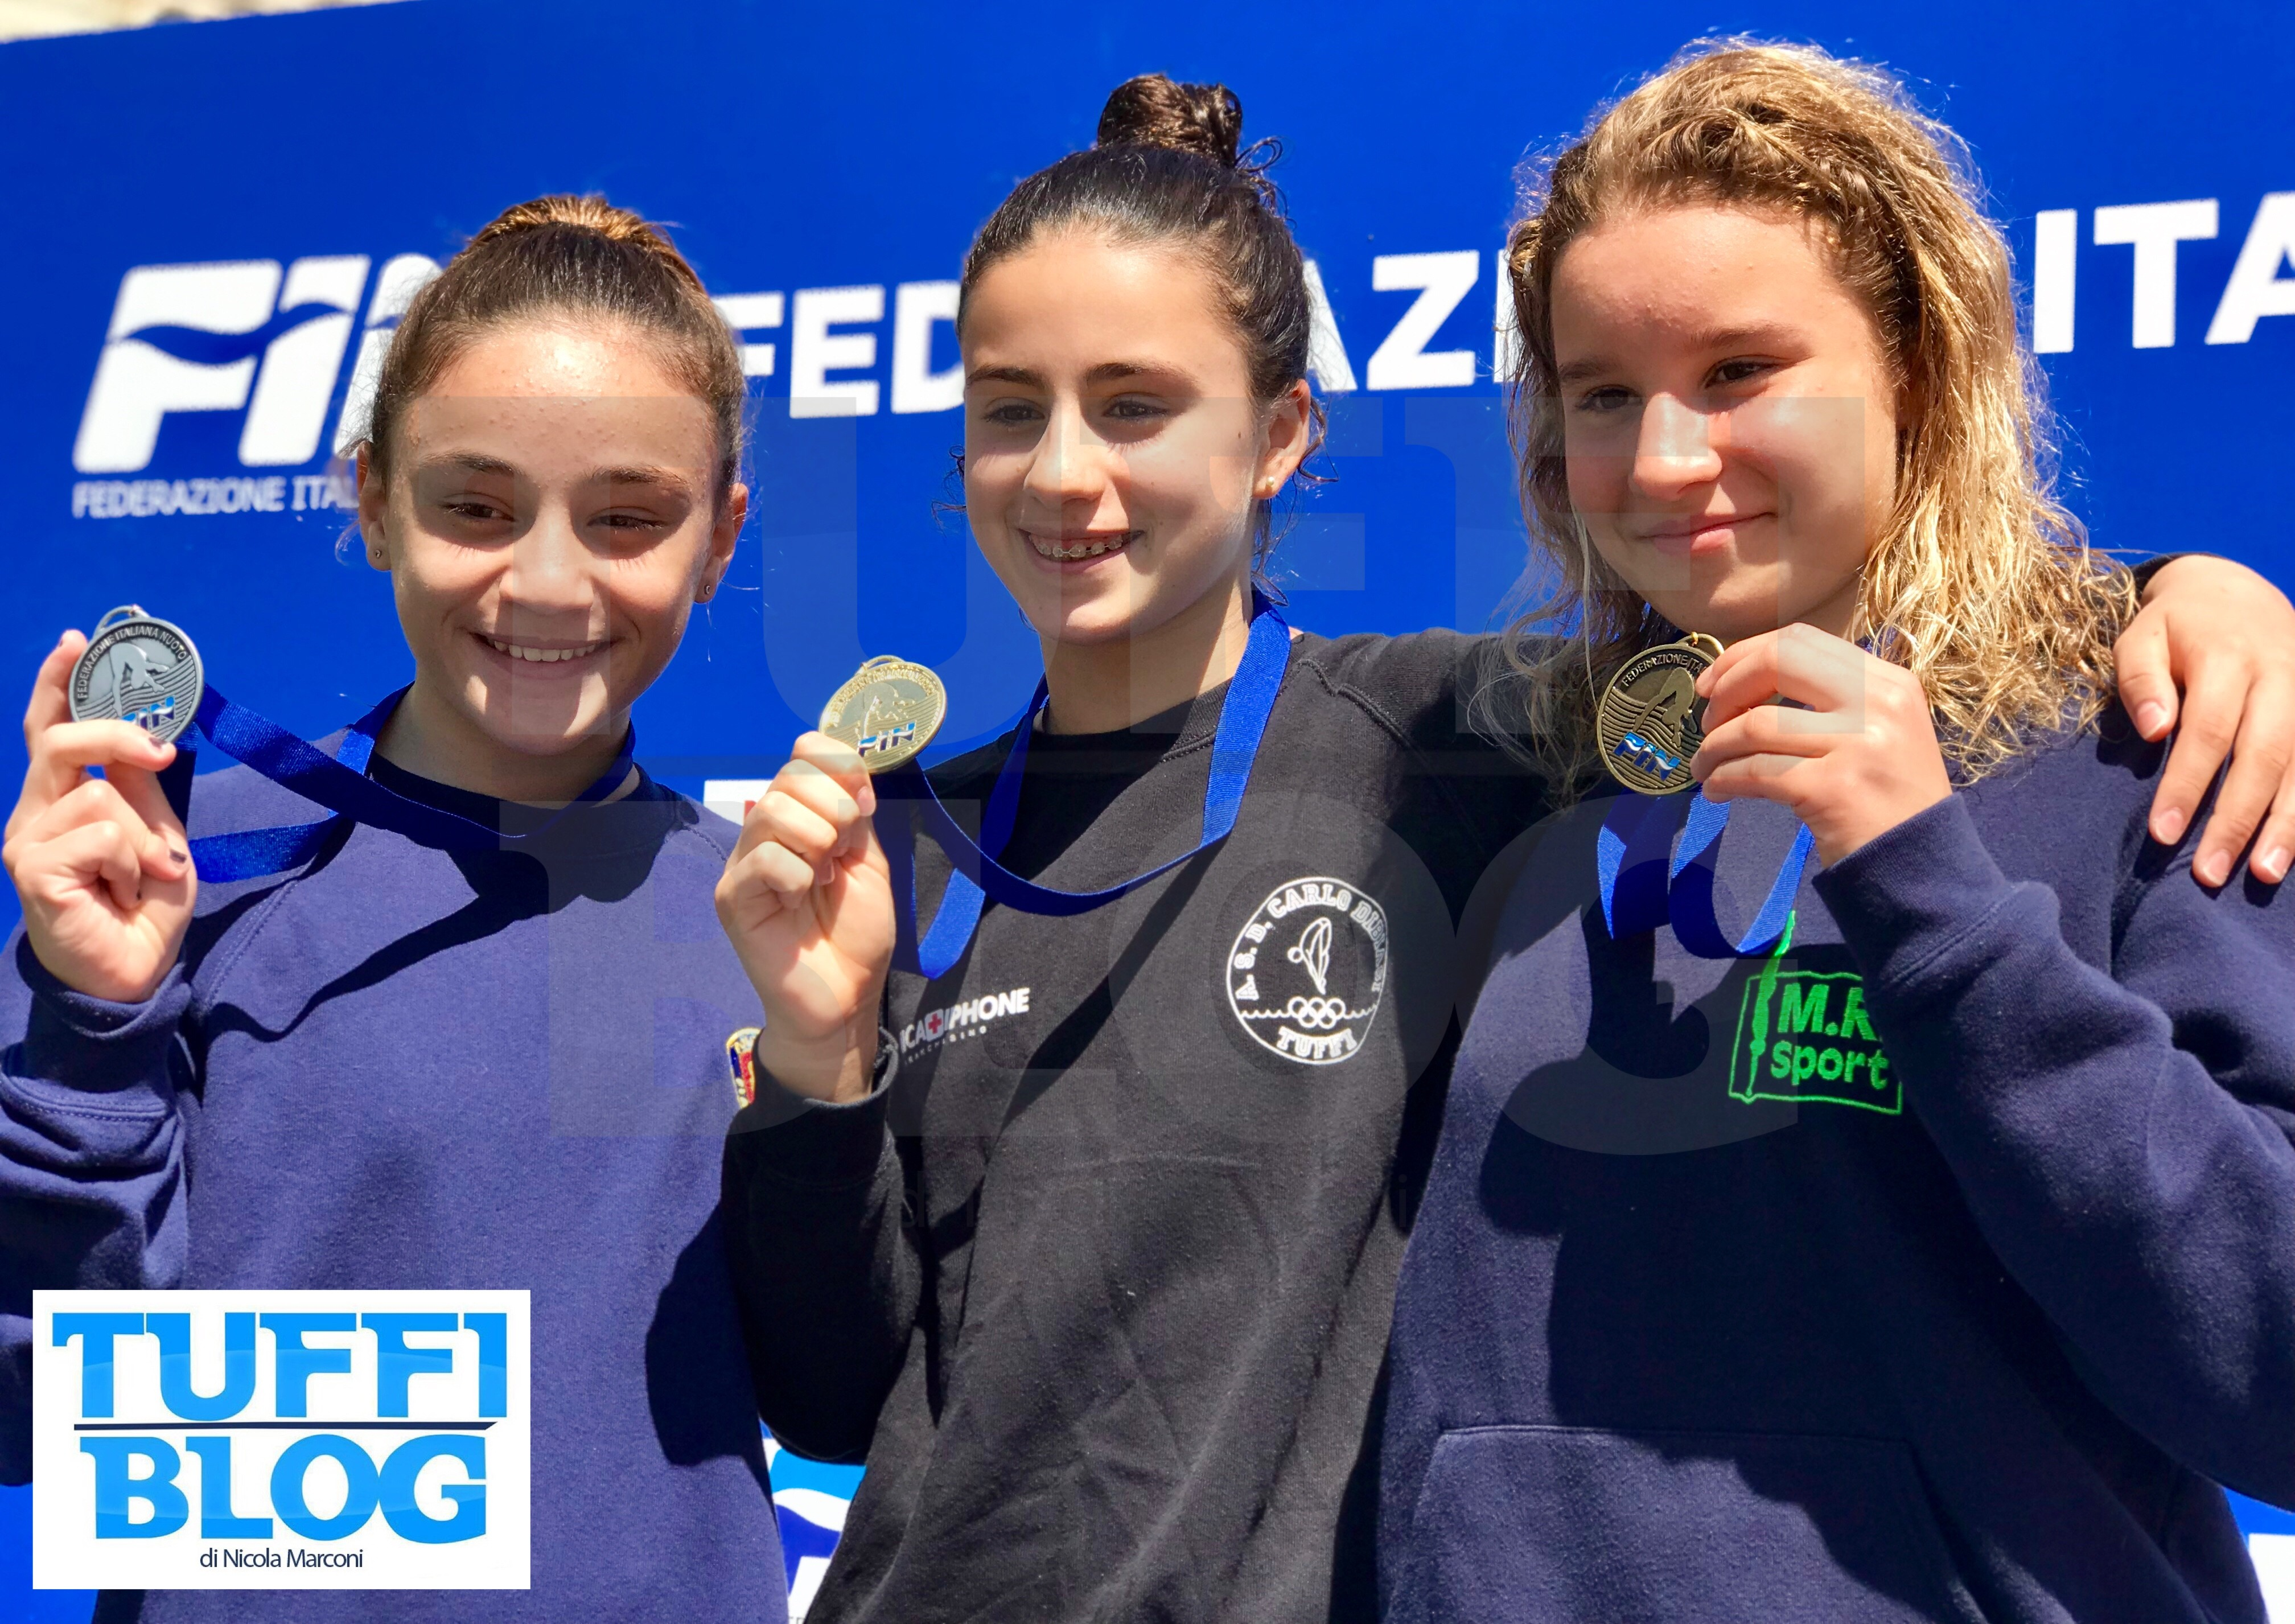 GP Atleti Azzurri: Roma - i risultati del venerdì mattina